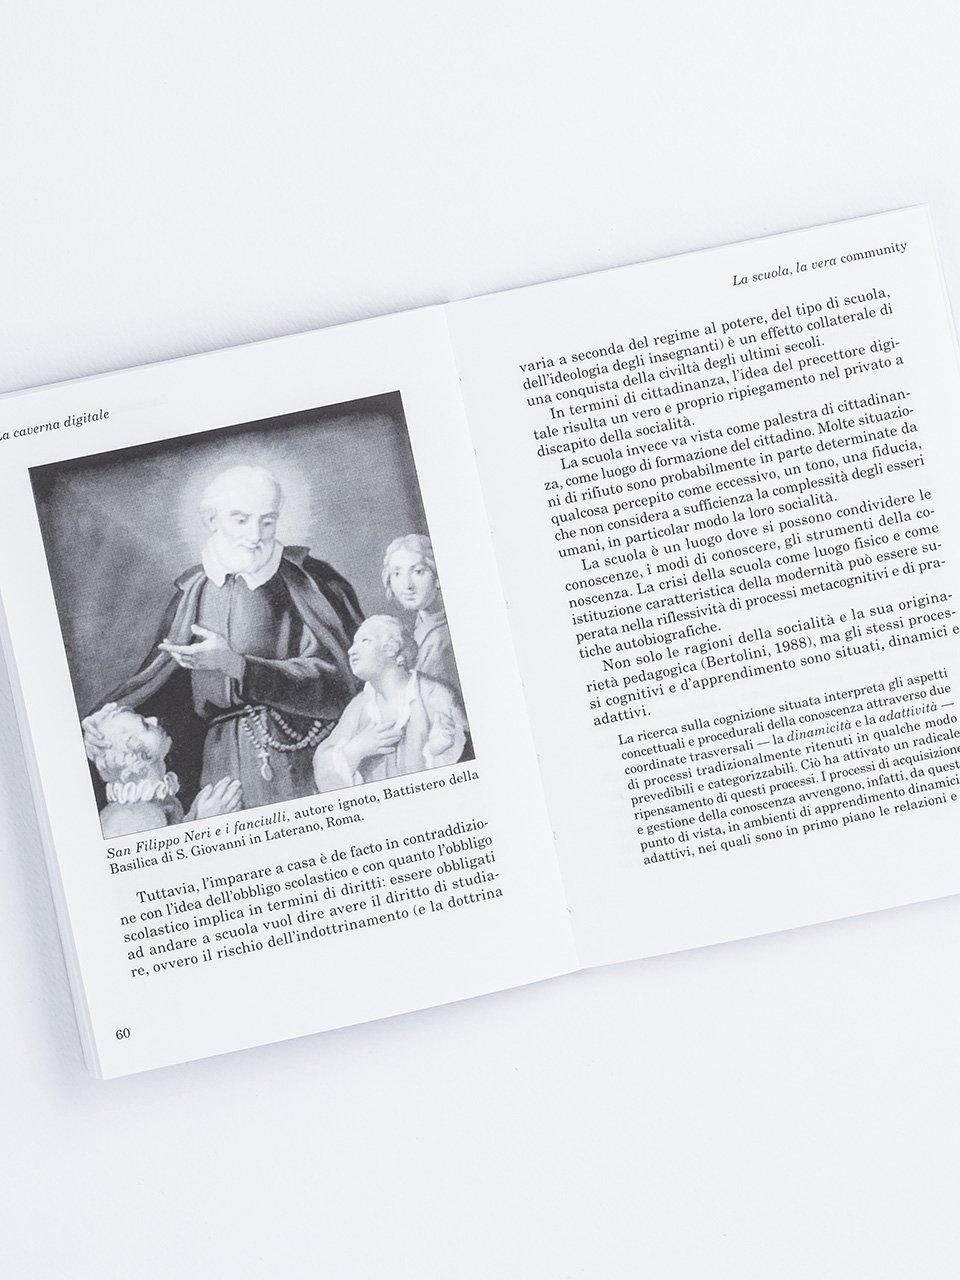 La caverna digitale - Libri - Erickson 2